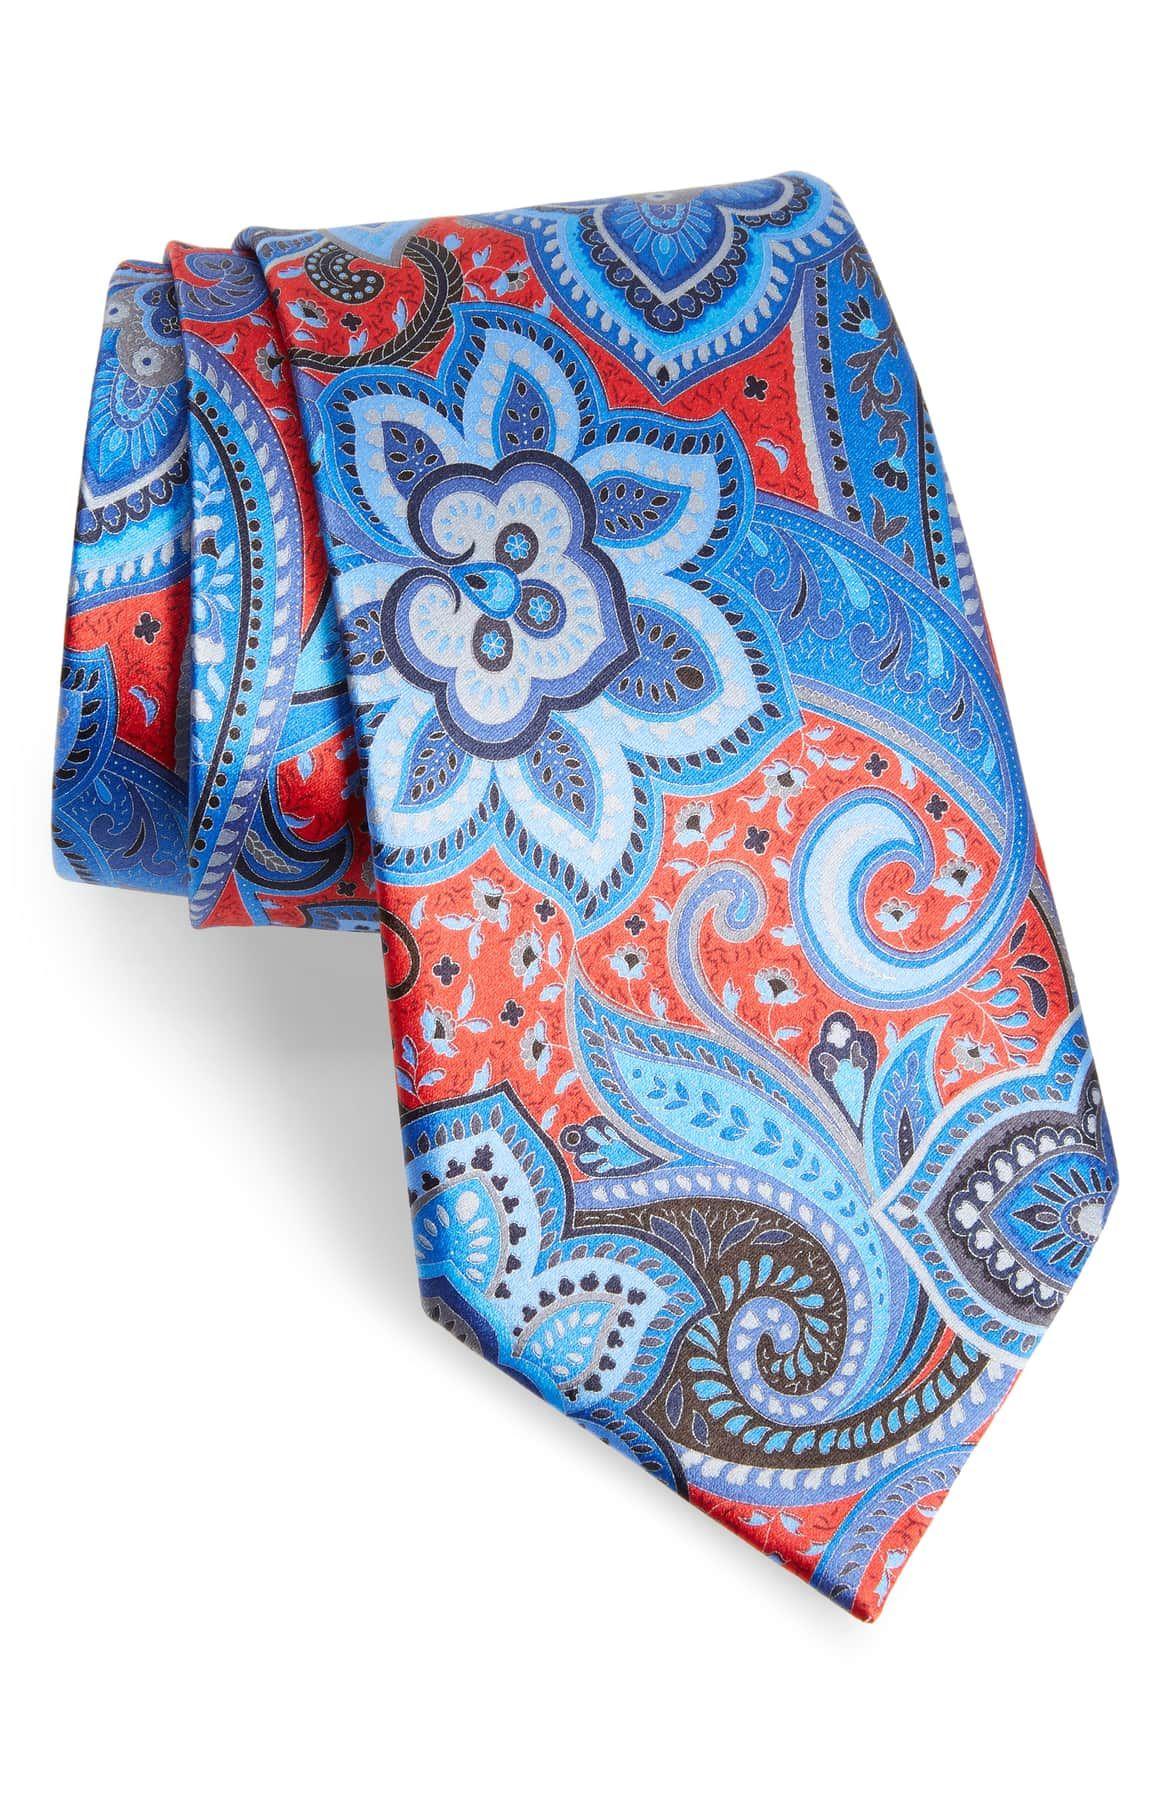 65414bcce43c Zegna Quindici Floral Paisley Silk Tie, orange with blue floral print tie